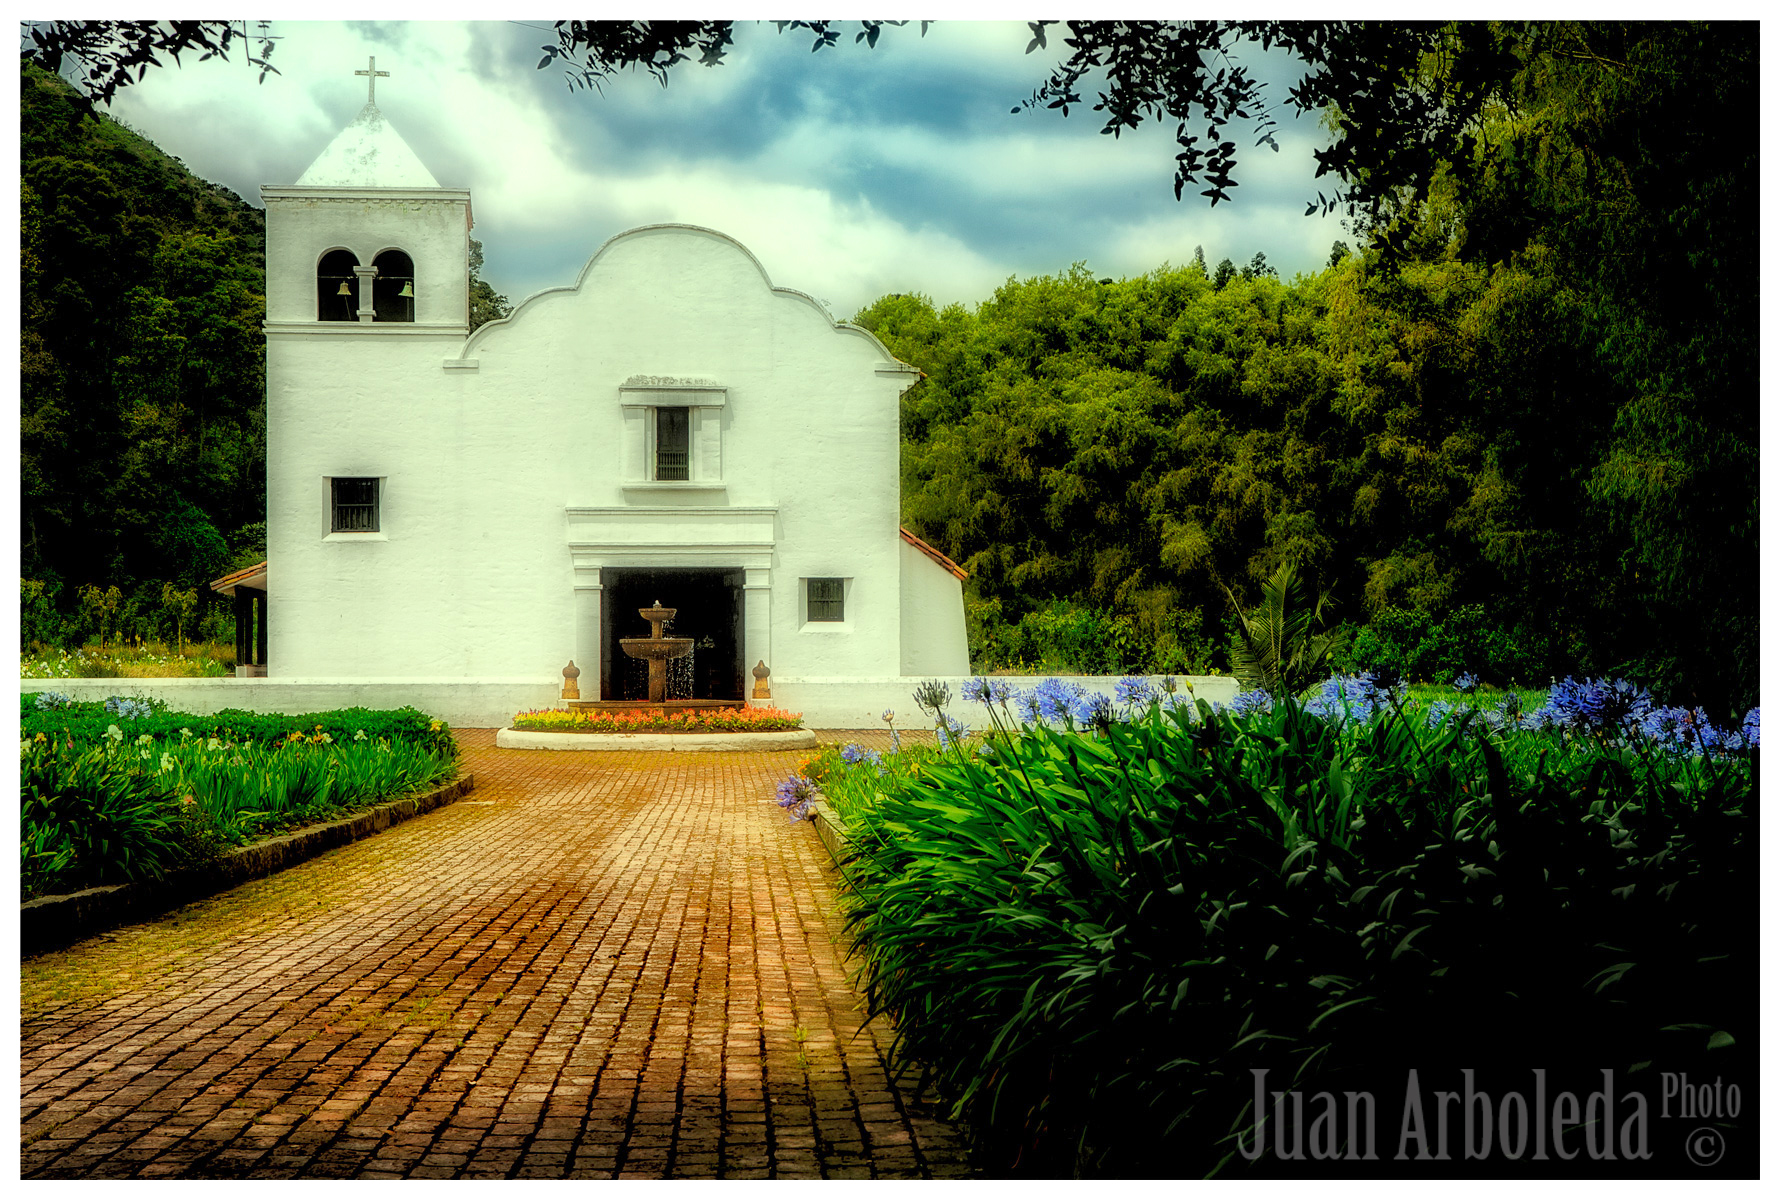 Fotografia de arquitectura juan arboleda fotografia - Fotografia arquitectura ...